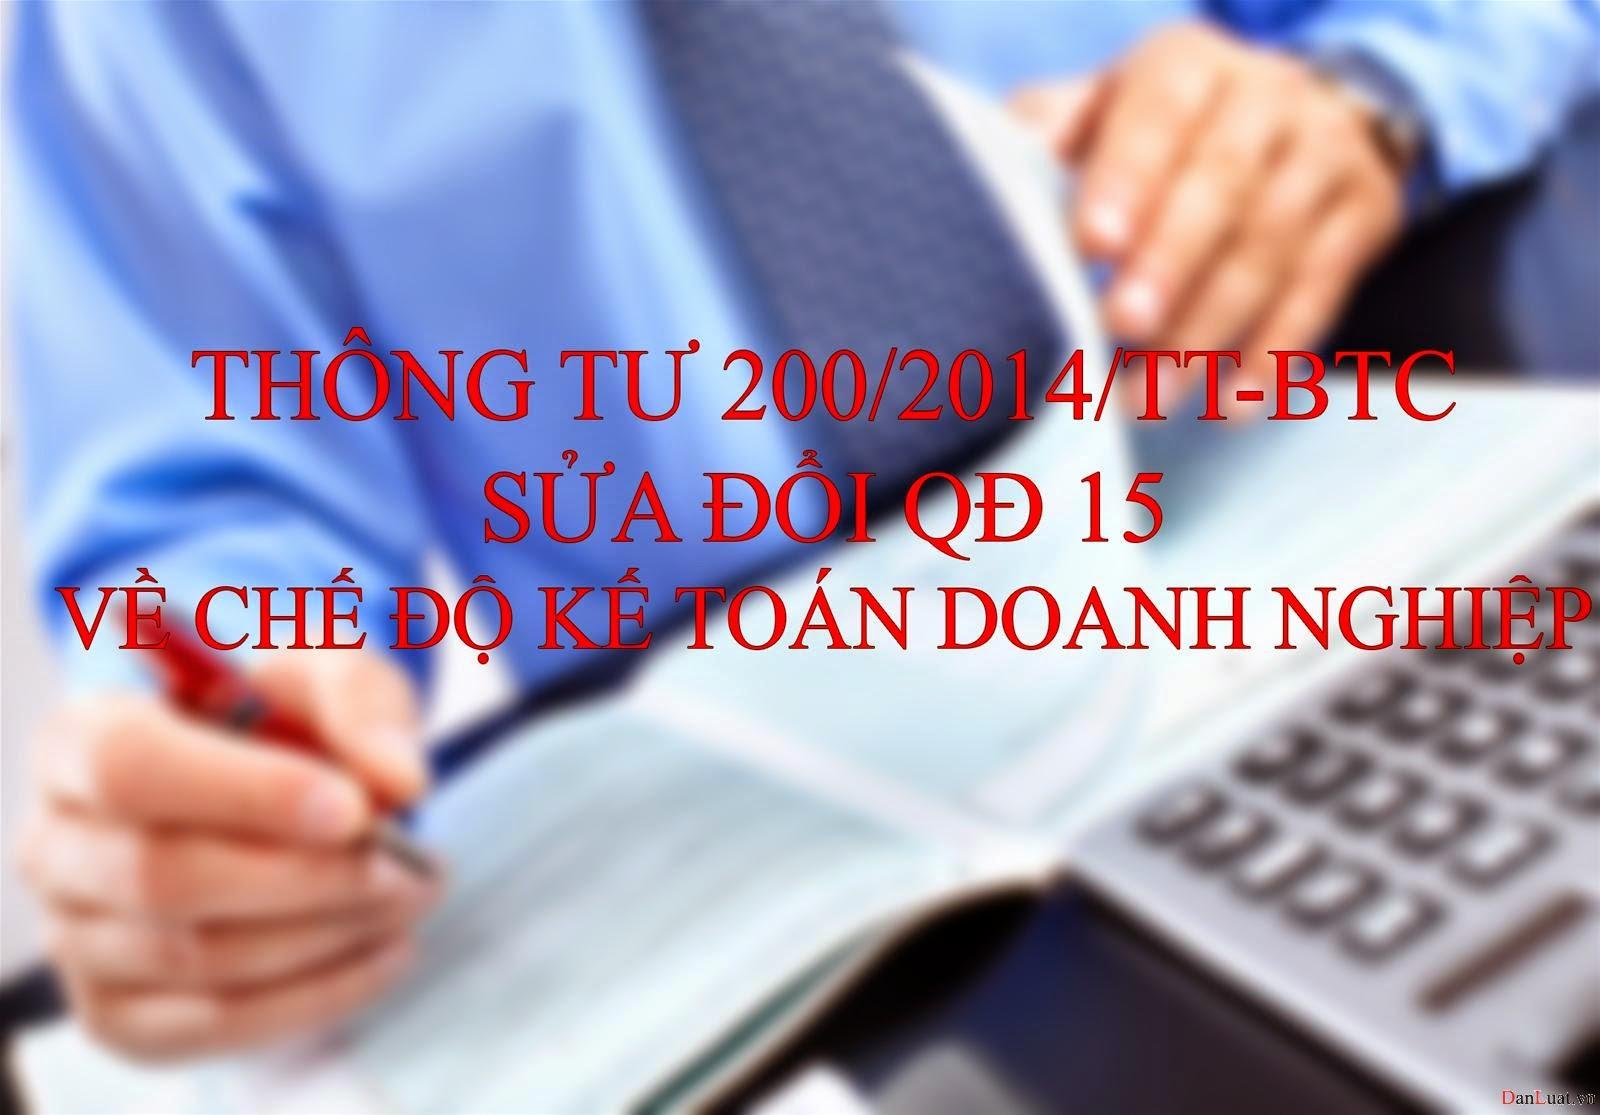 Thông tư 200/2014/TT-BTC